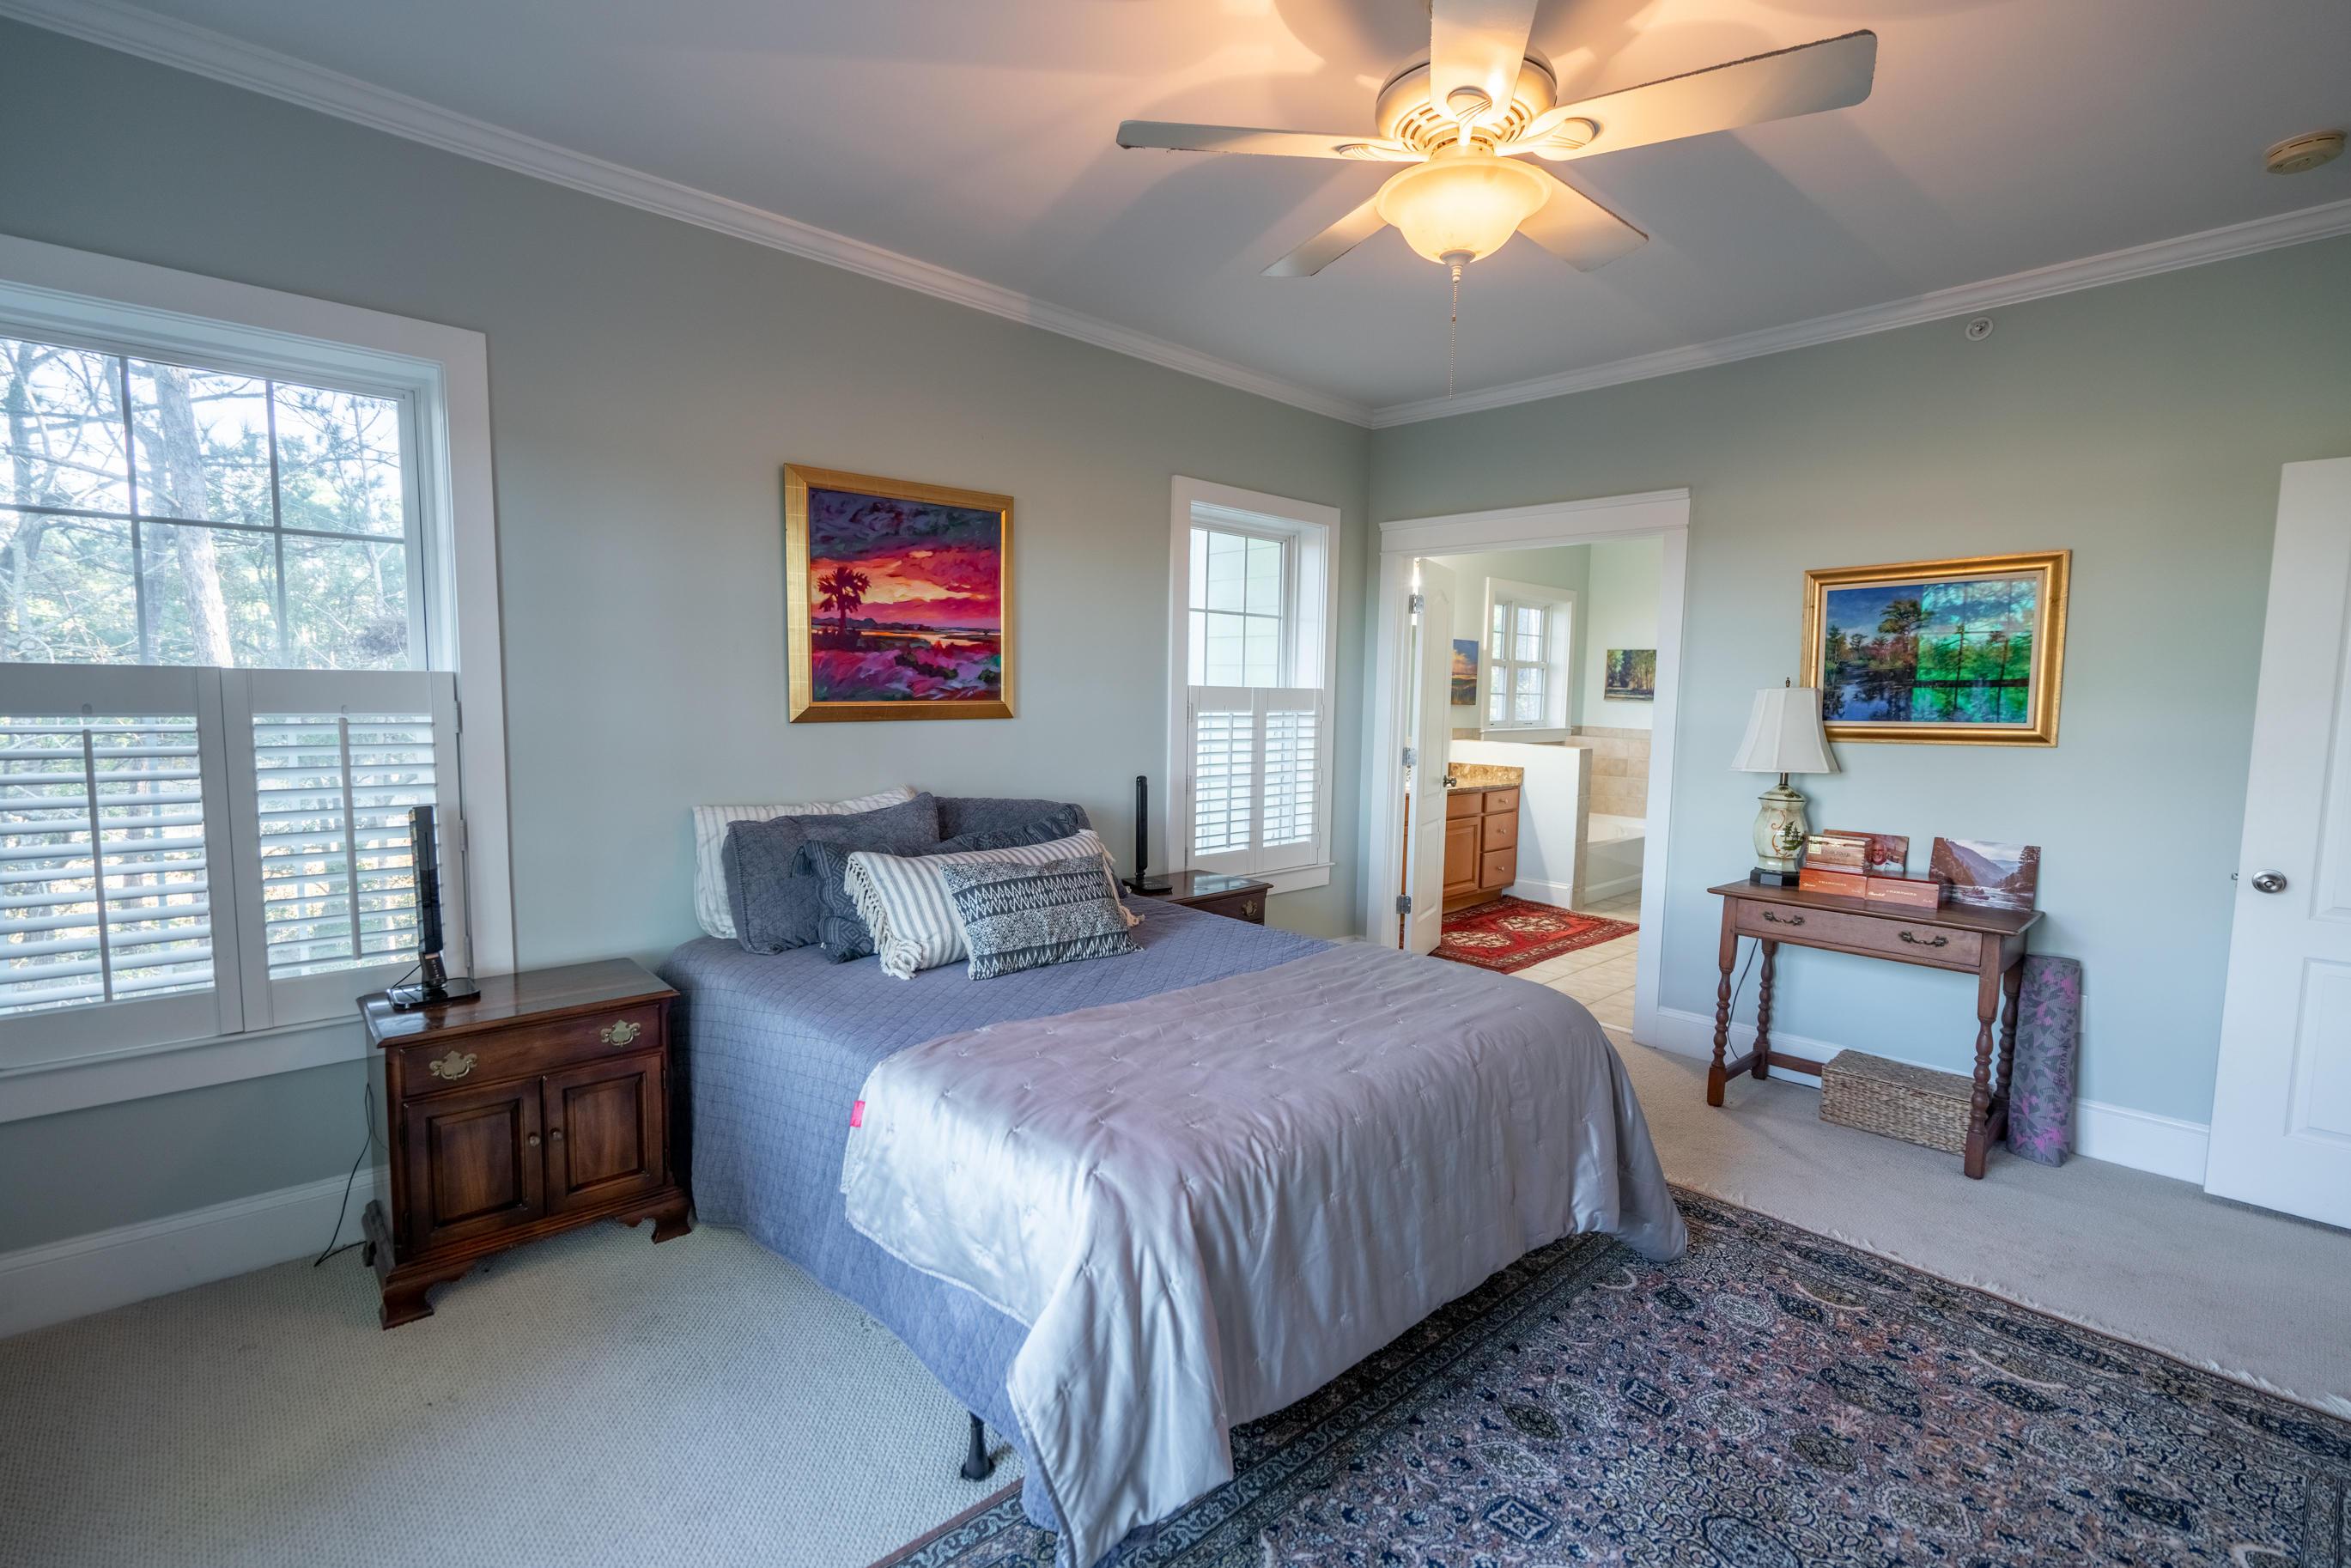 Etiwan Pointe Homes For Sale - 132 Winding Creek, Mount Pleasant, SC - 1